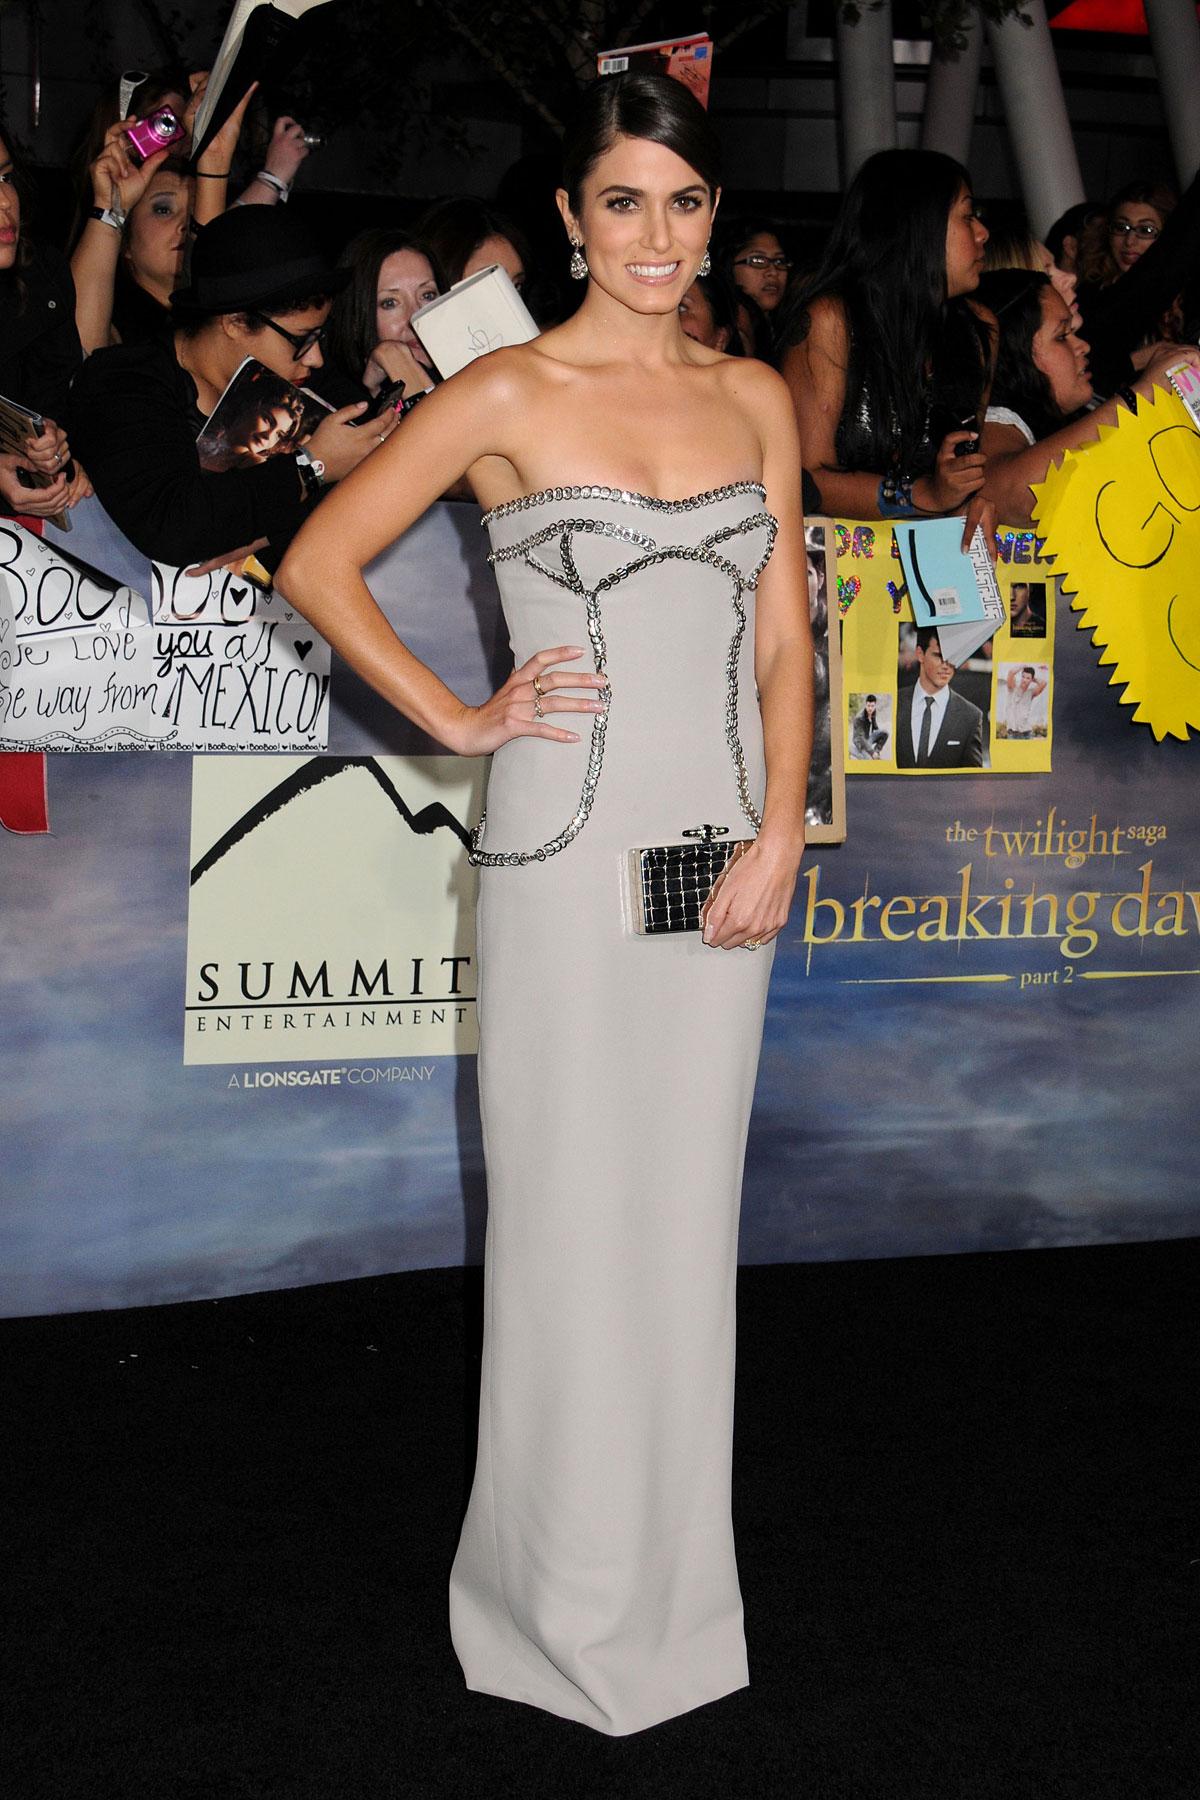 Fashion (2008) - HD Movies Watch Online Free - PART 2 - Video 67